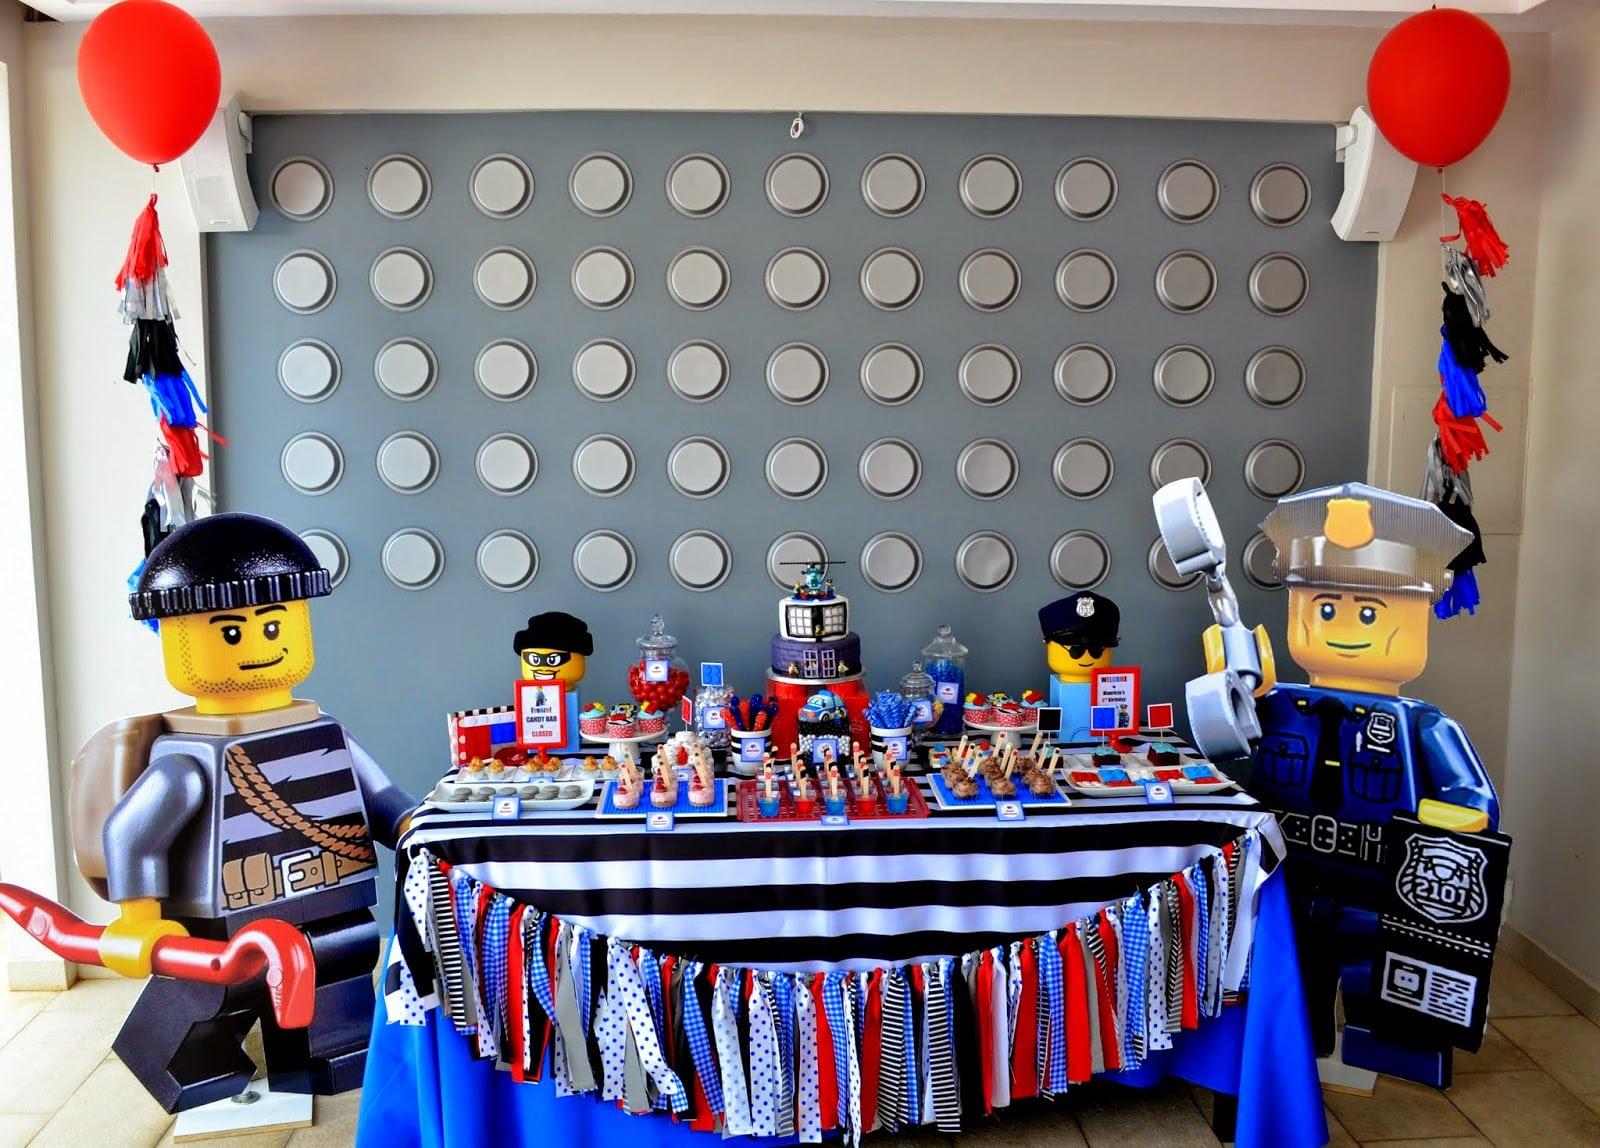 Party city invitations for birthdays partycityinvitationsforbirthdays2g stopboris Gallery